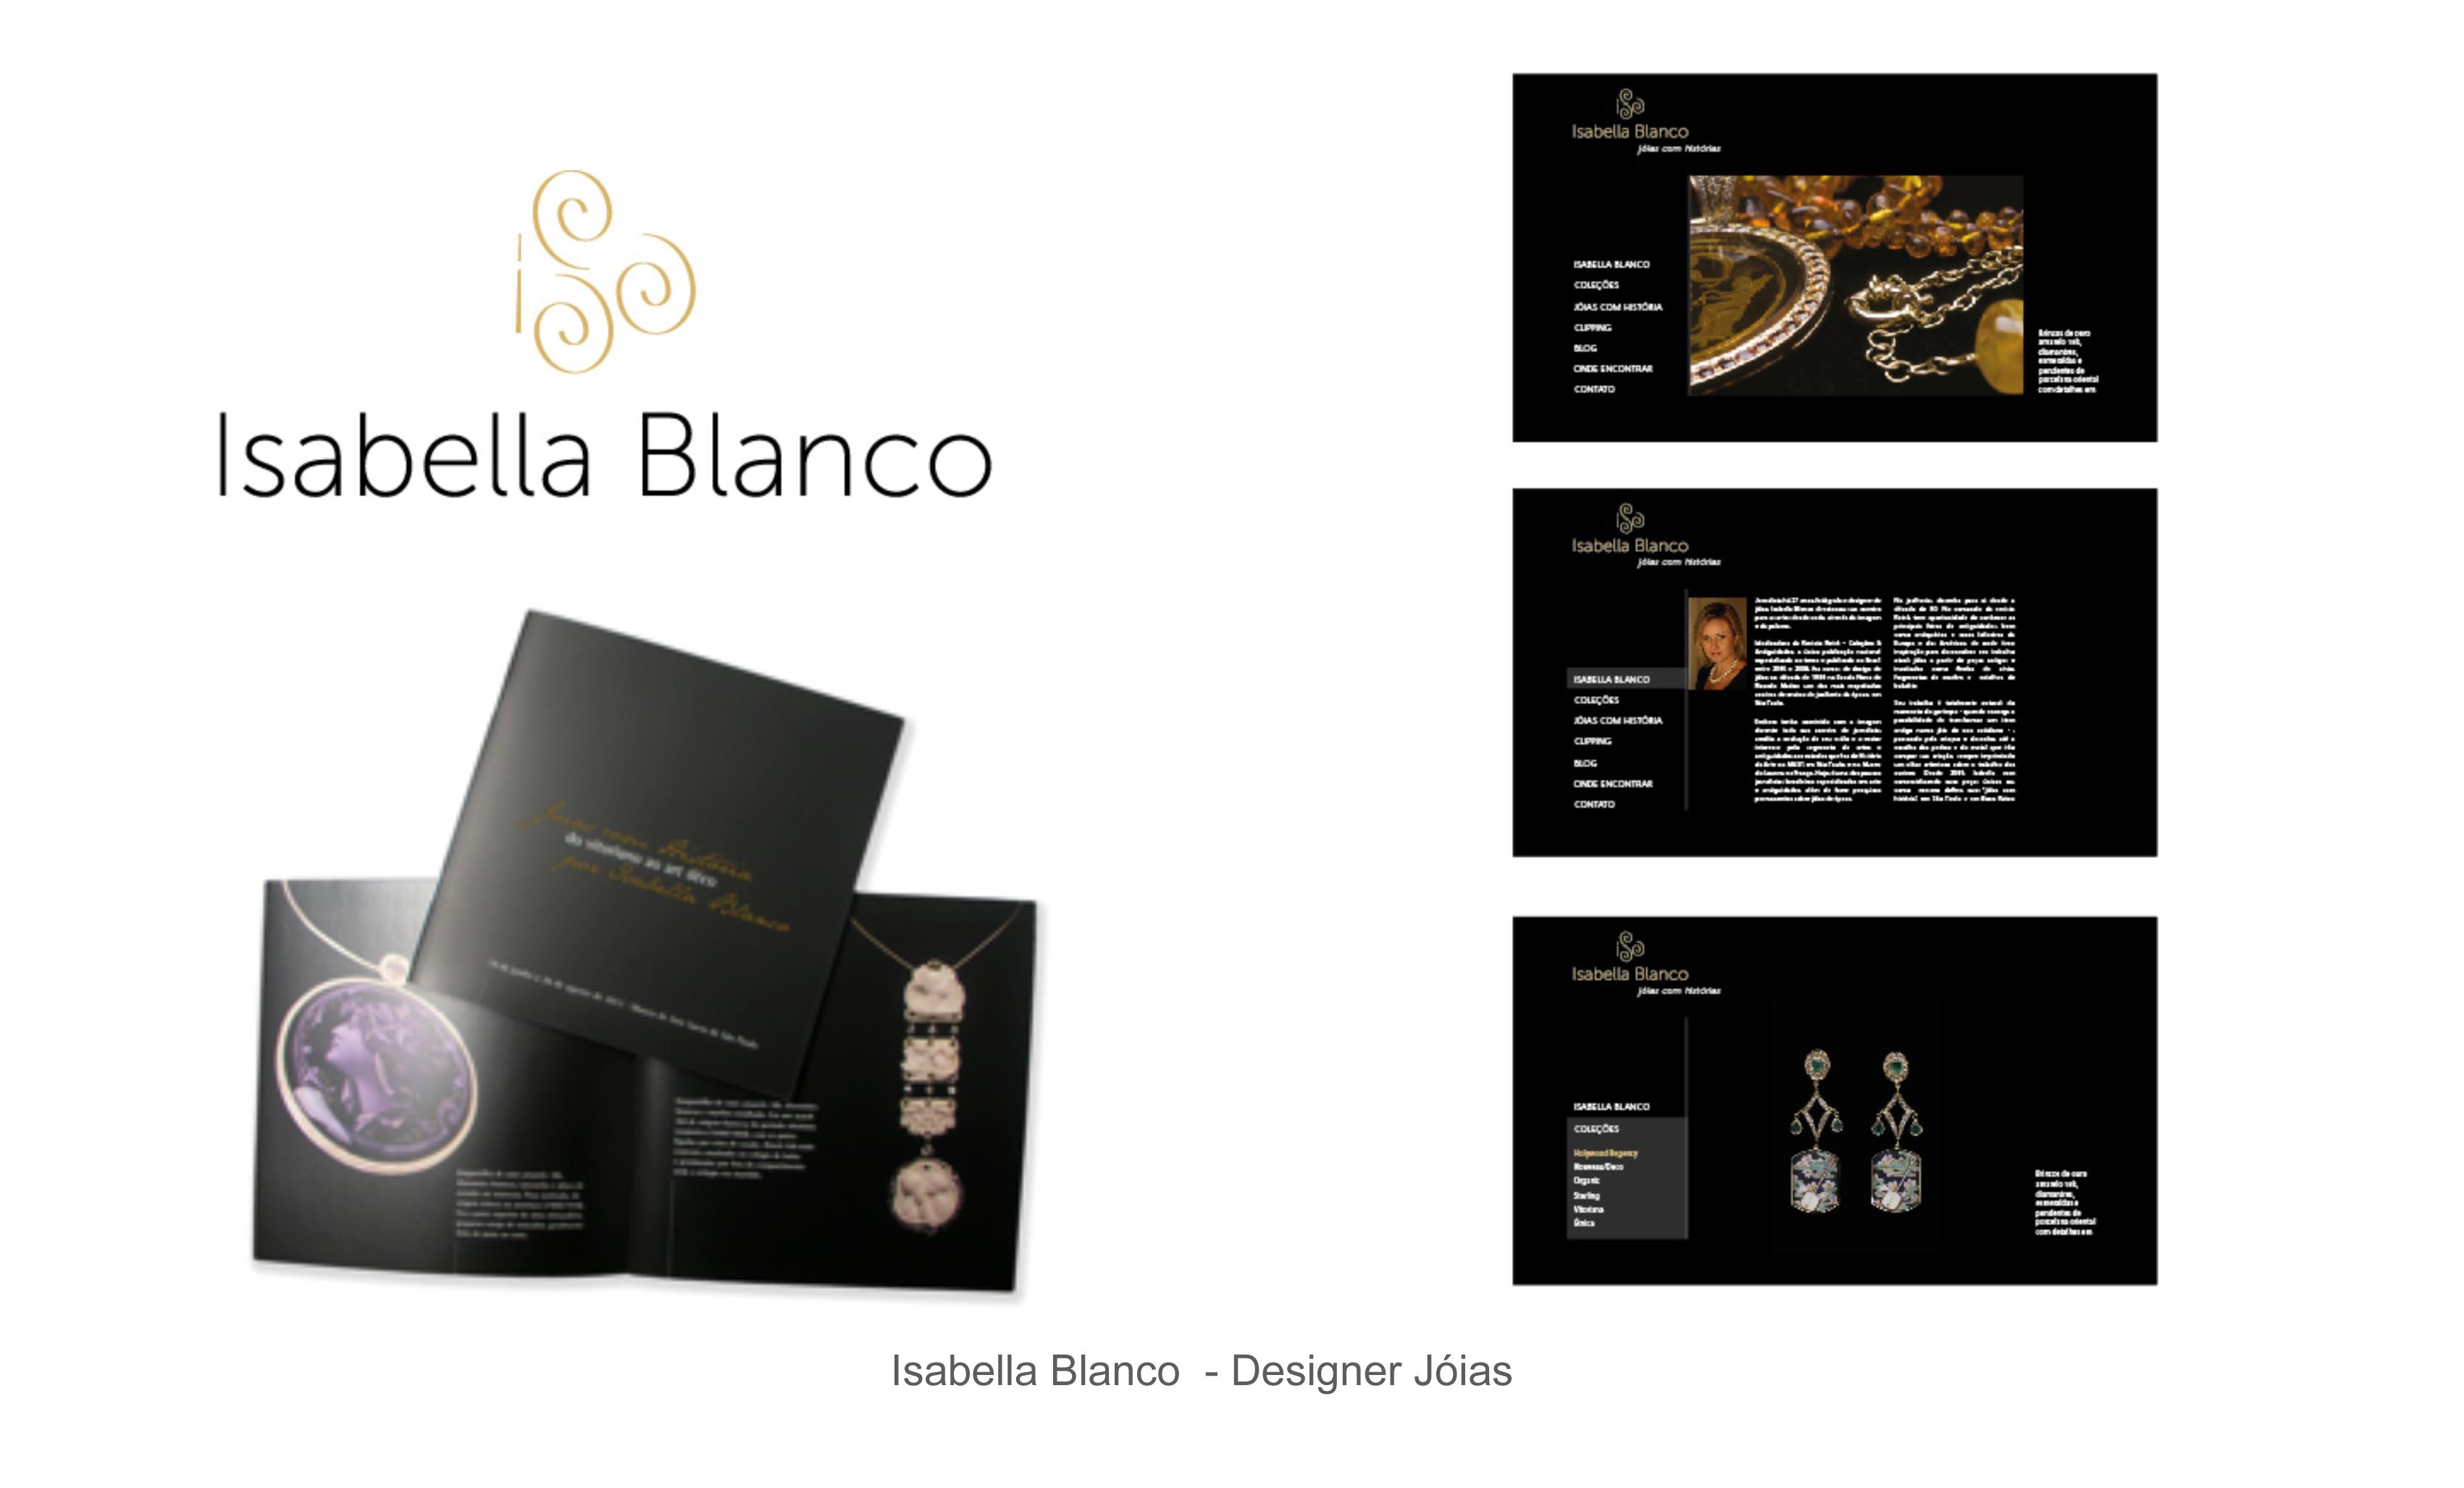 Isabella_Blanco.jpg